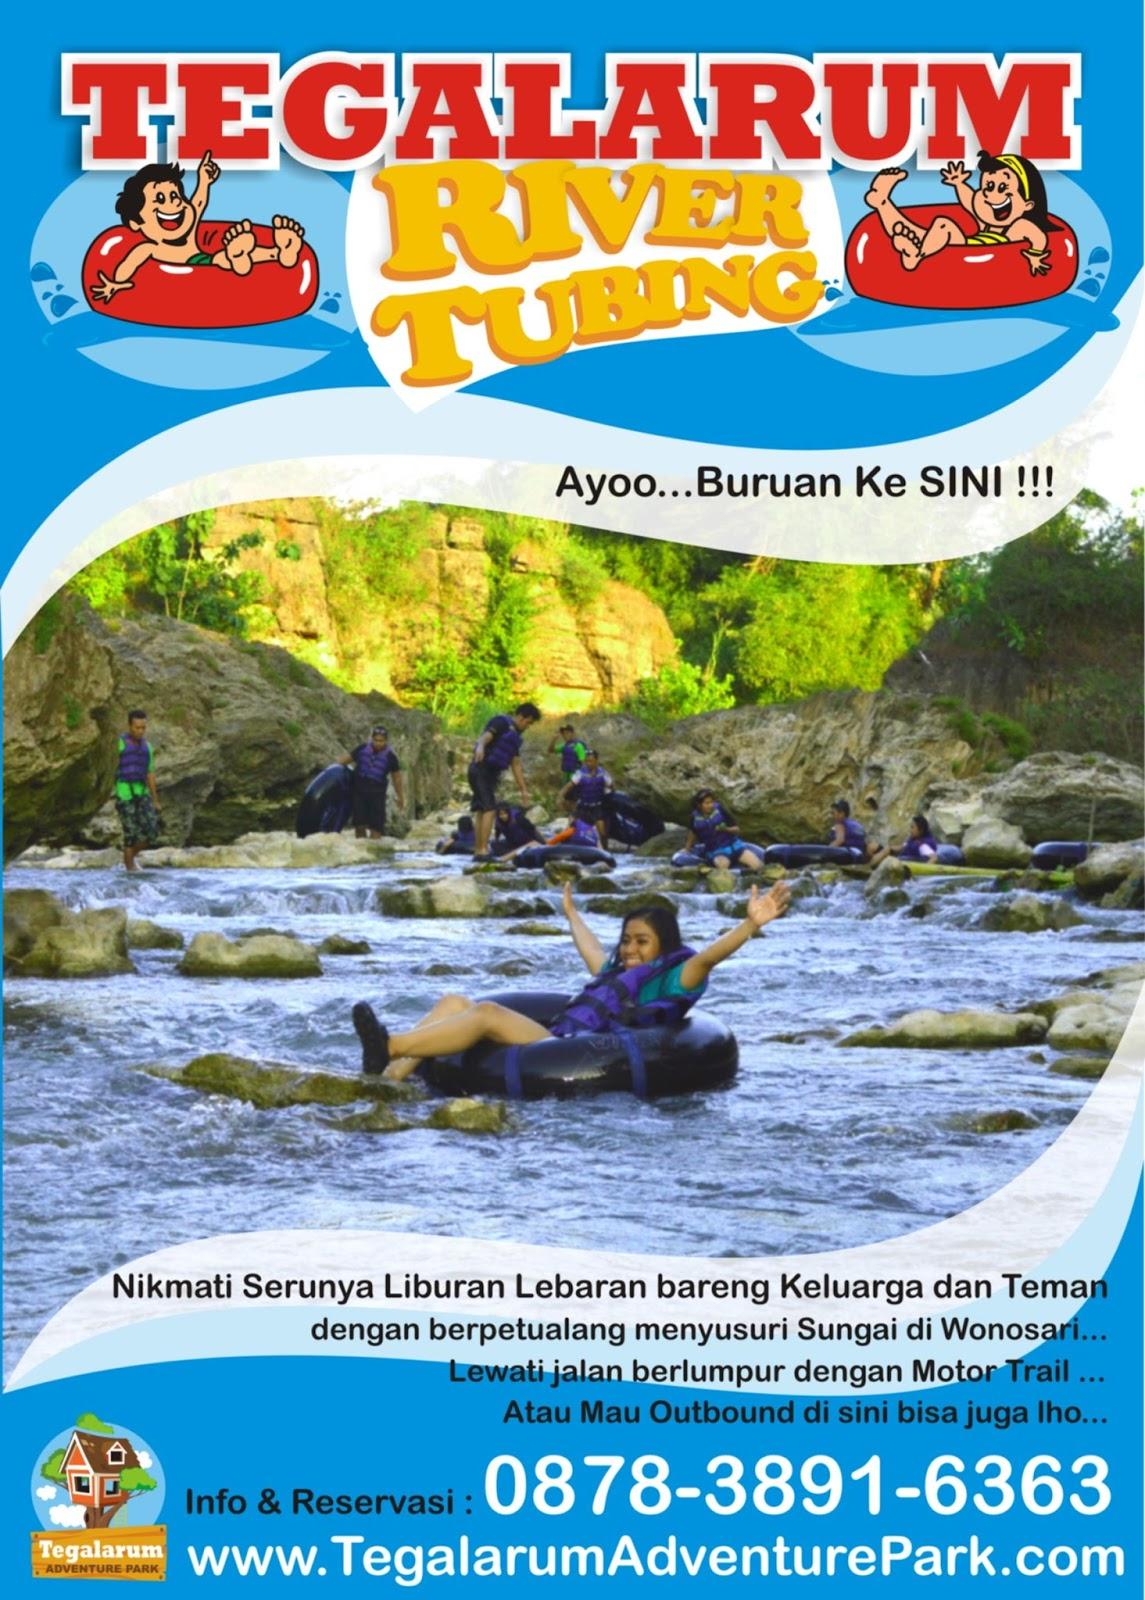 Tempat Wisata Wonosari Tegalarum Adventure Park Image Kab Gunungkidul